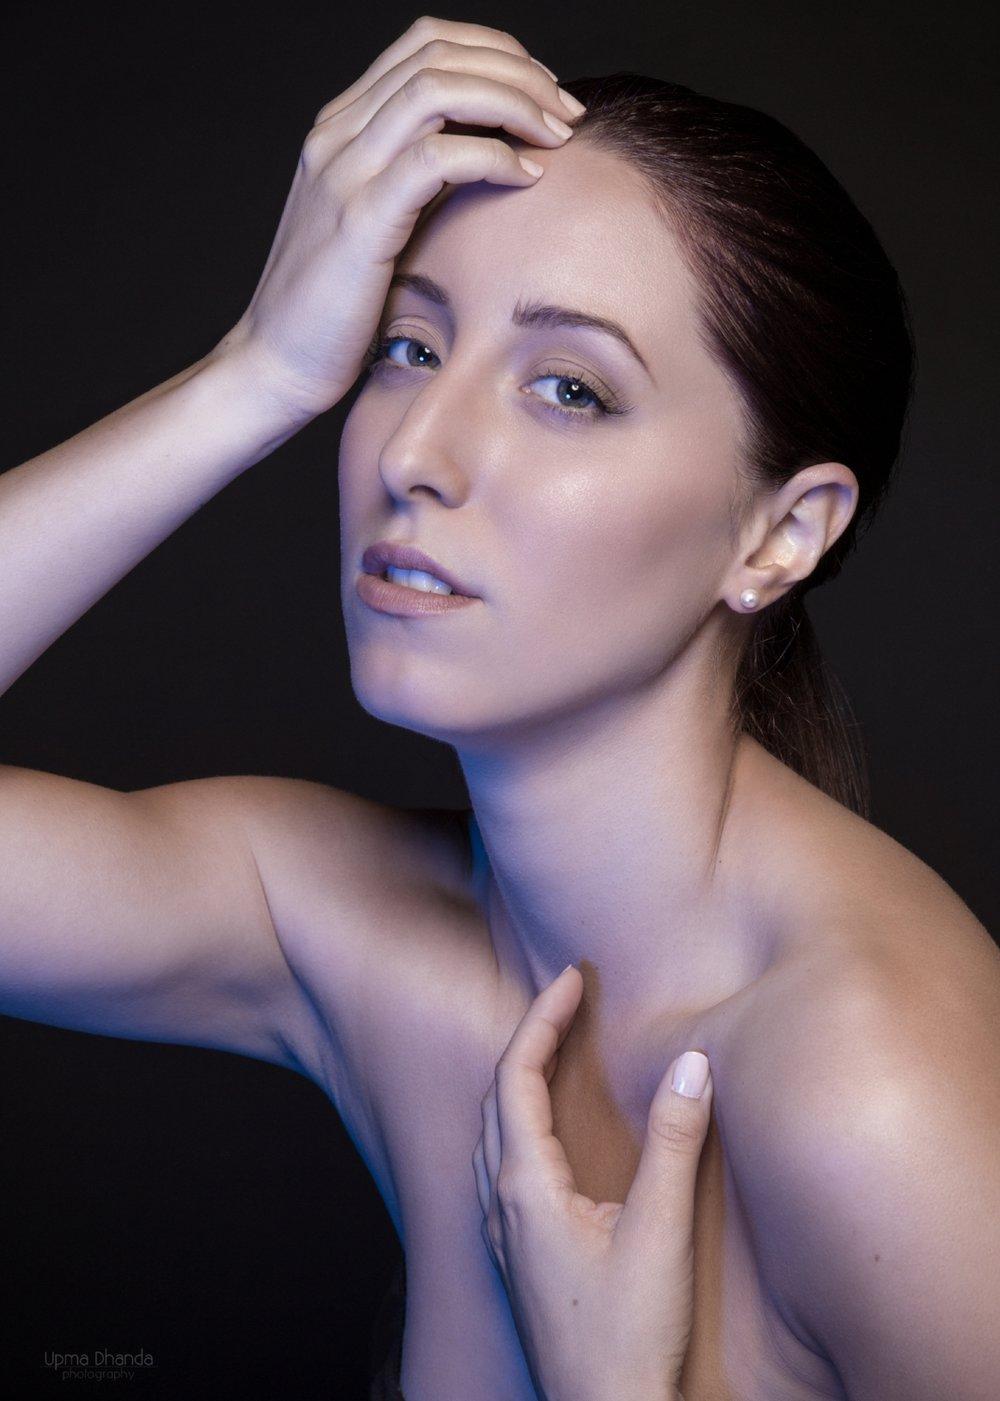 Model: Devon Simone Photographer: Upma Dhanda